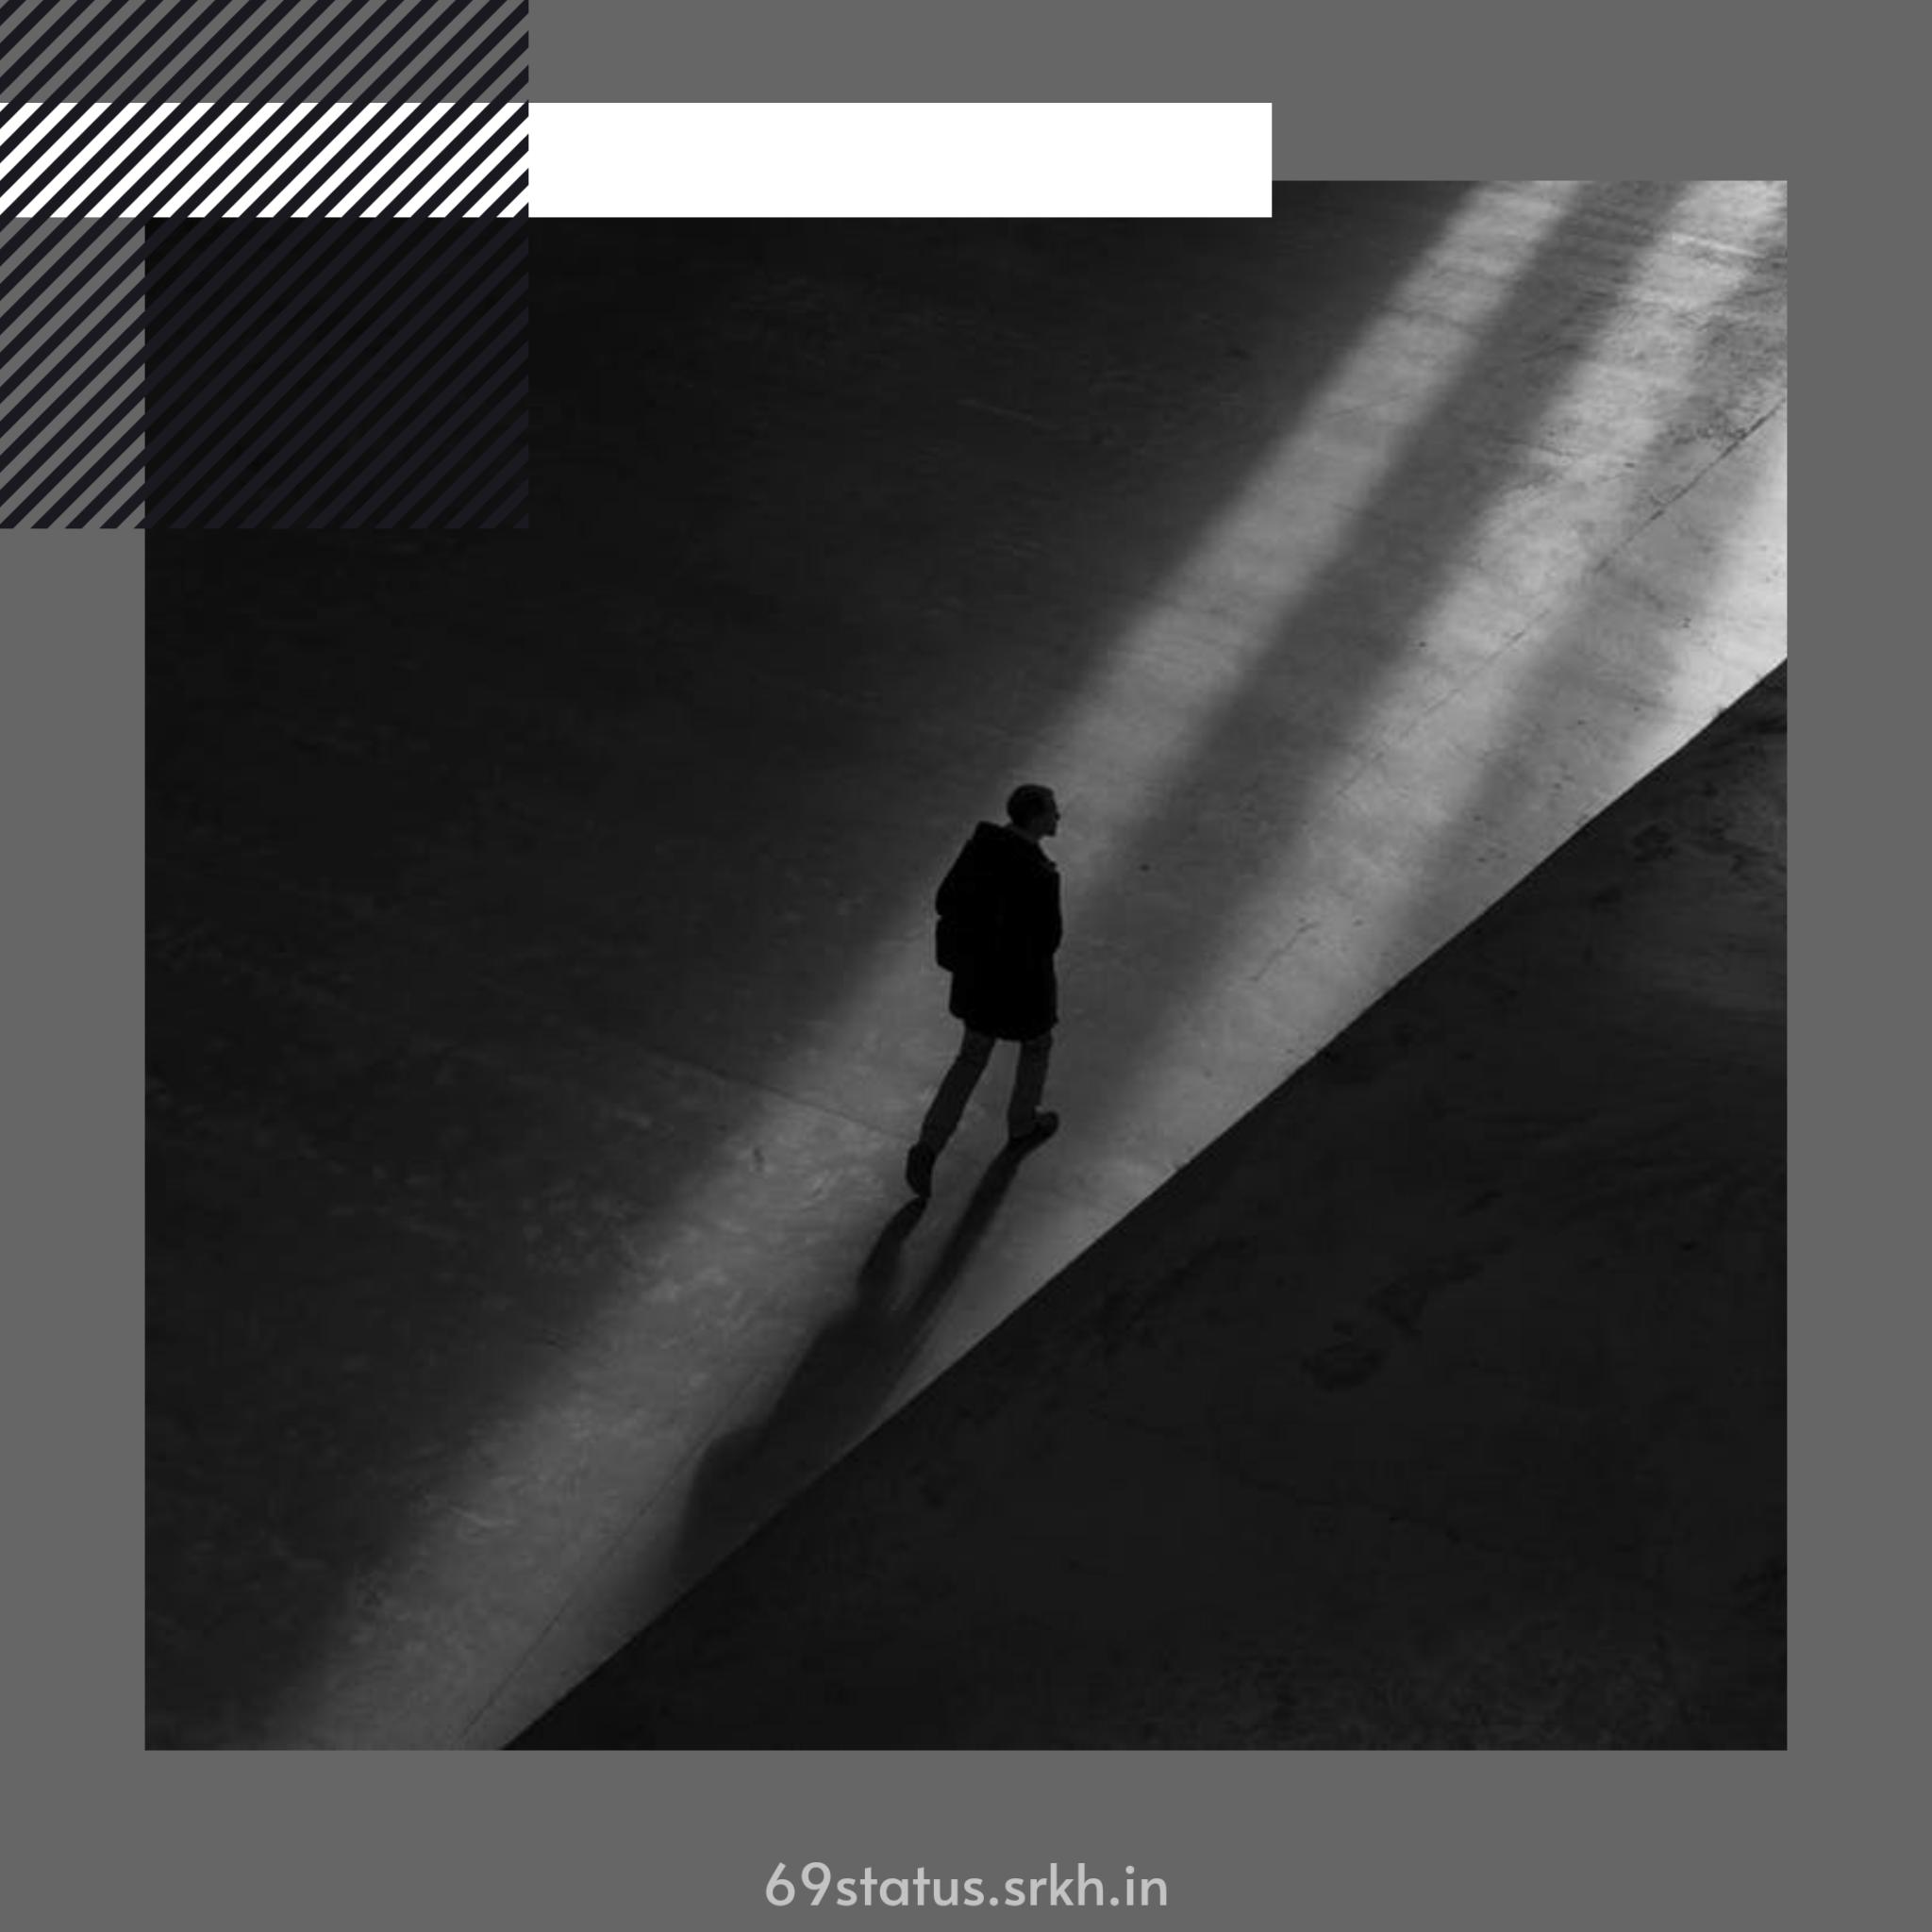 Sad Photo HD Sad Boy Walking Alone Download free - Images ...